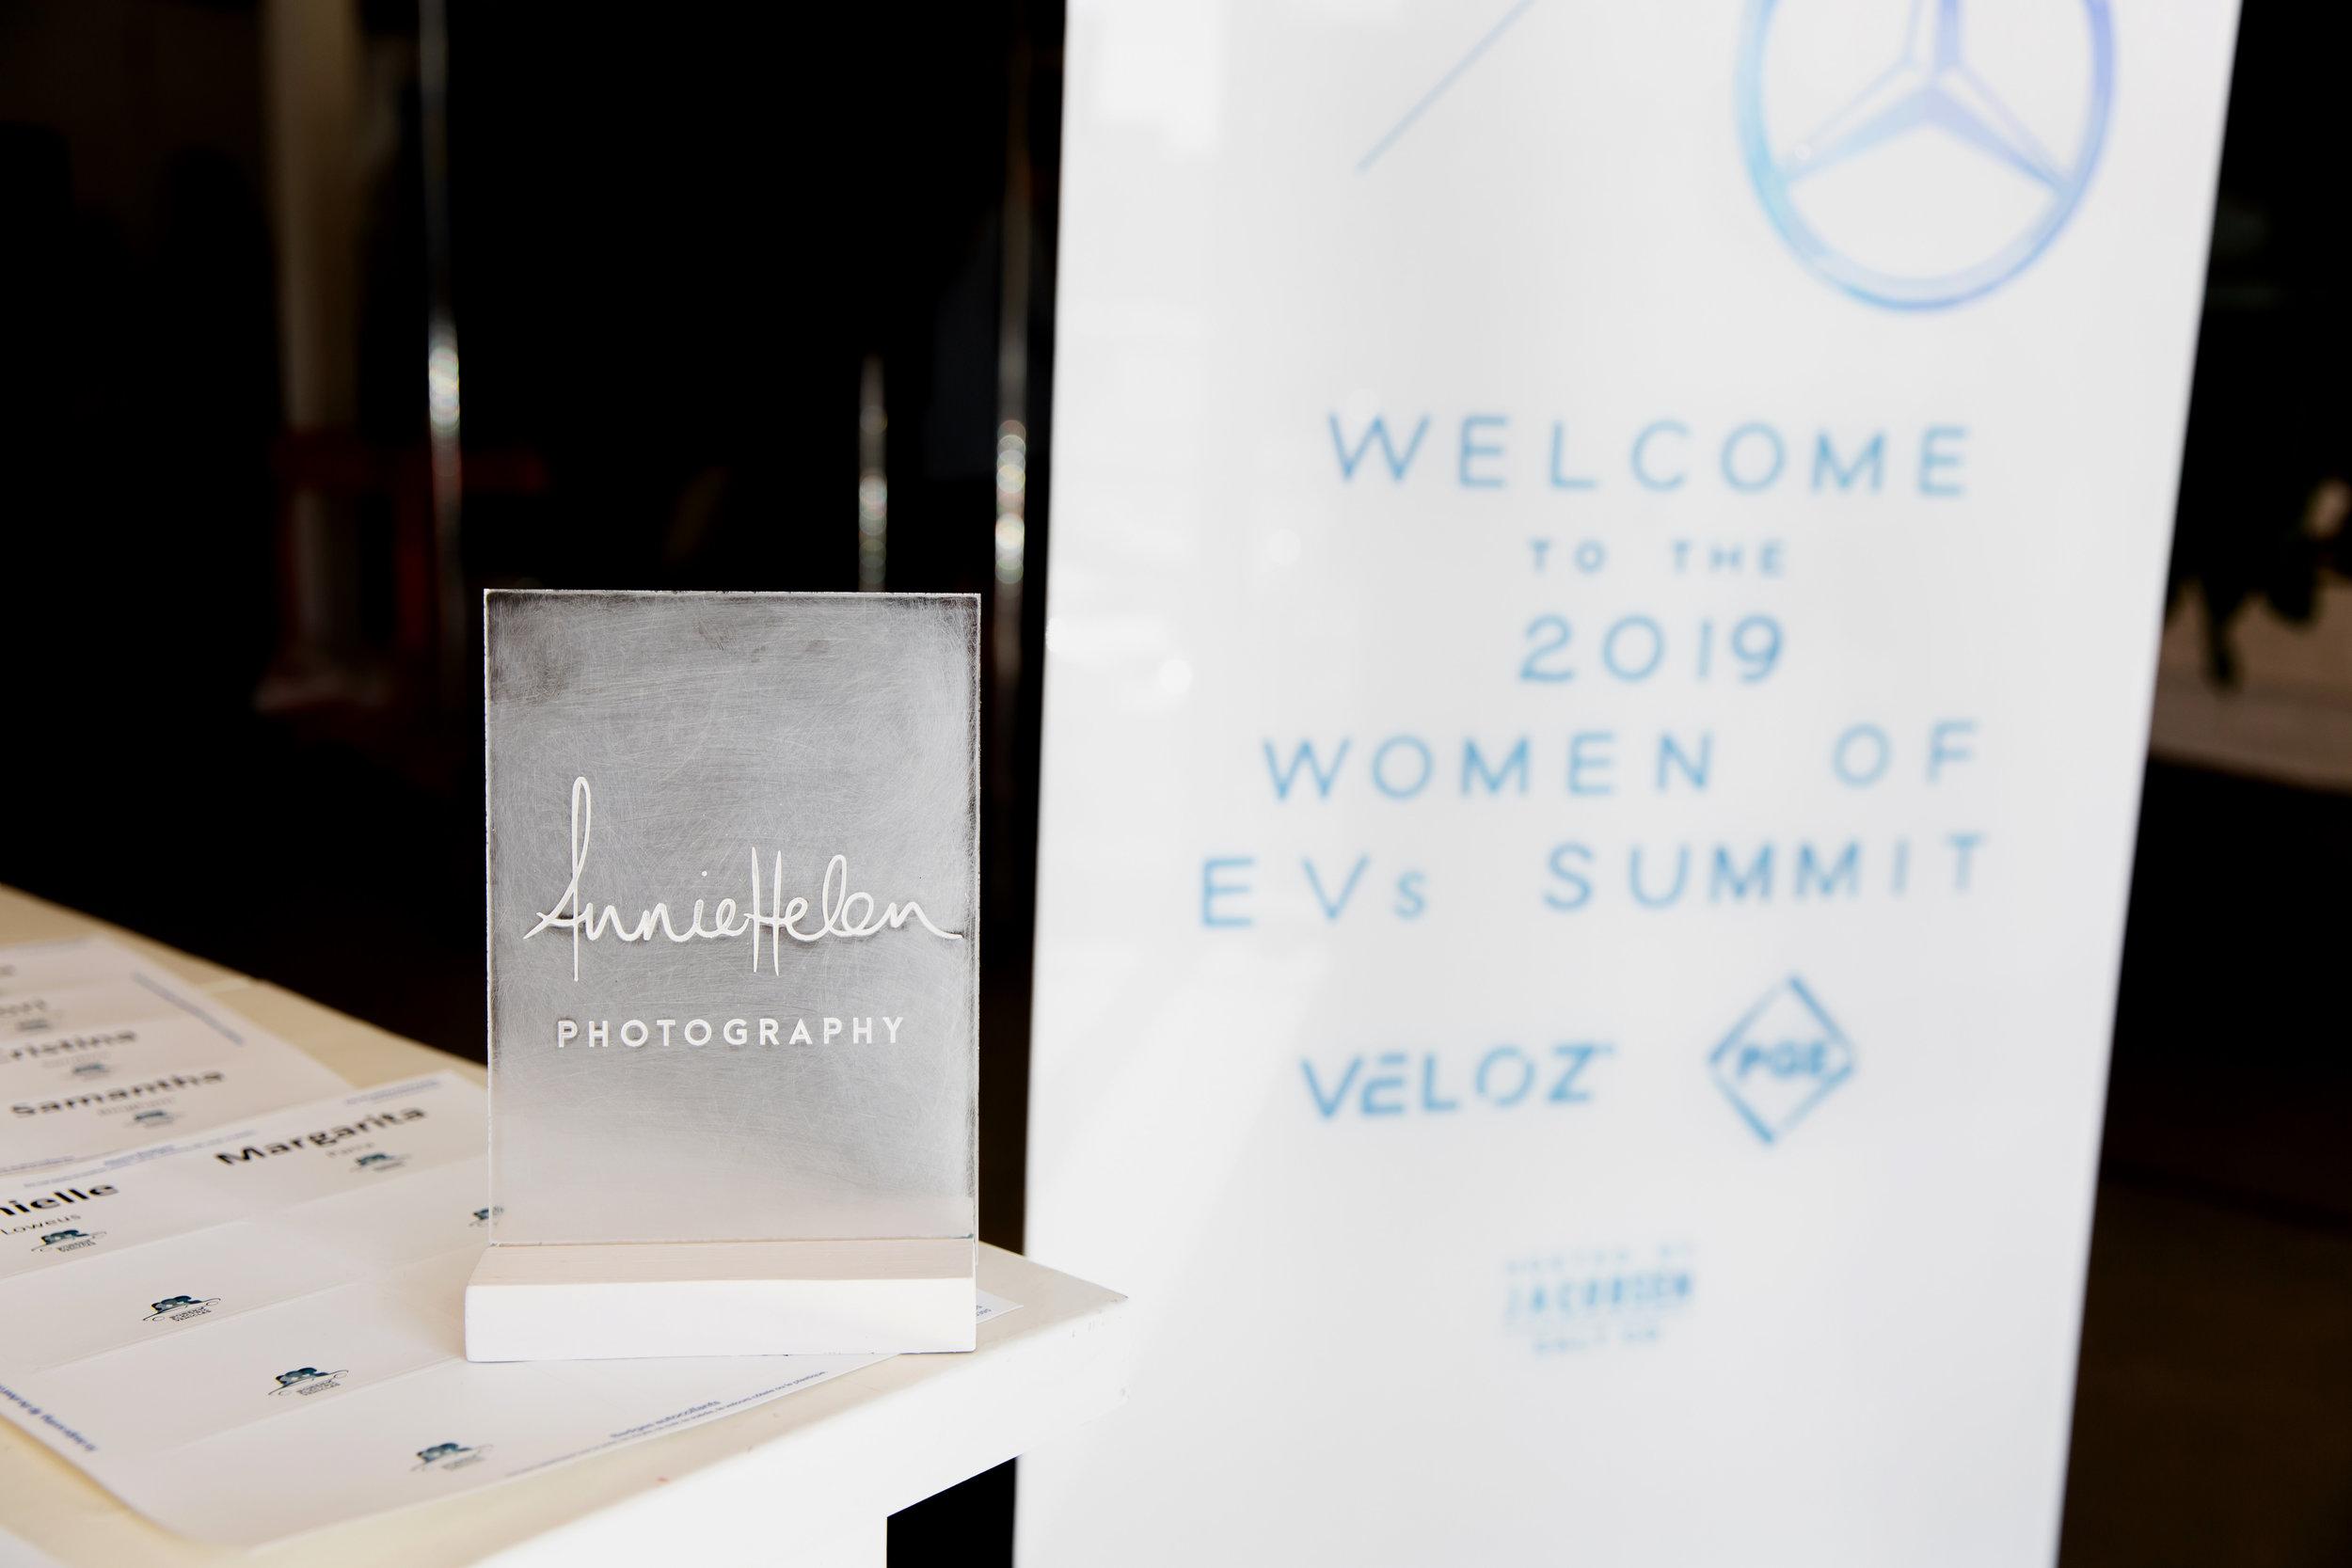 Women_of_EV_Annual_Summit_2019-7878.jpg